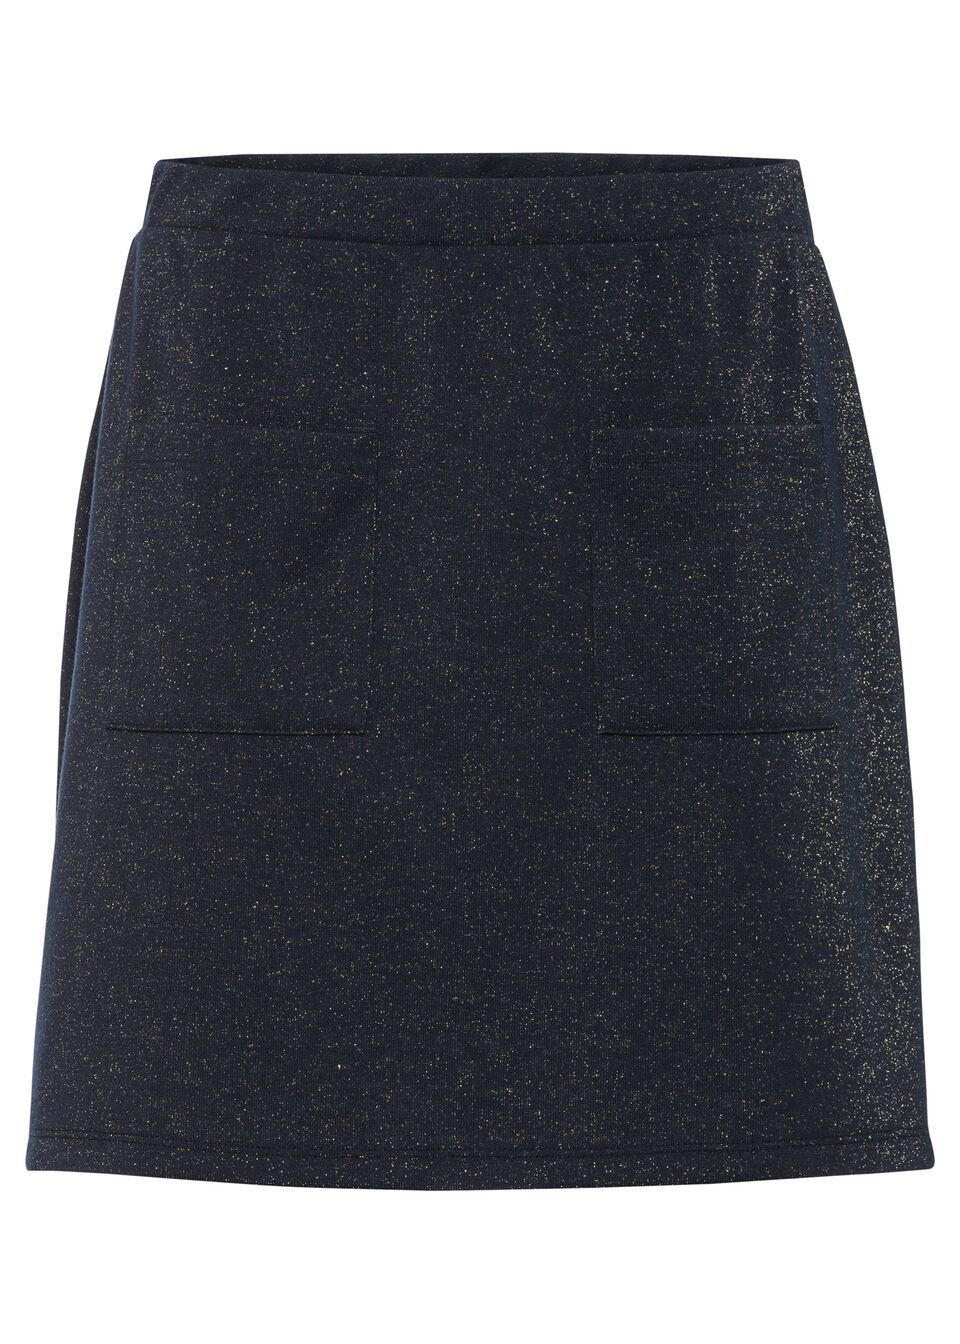 Spódnica bonprix ciemnoniebieski